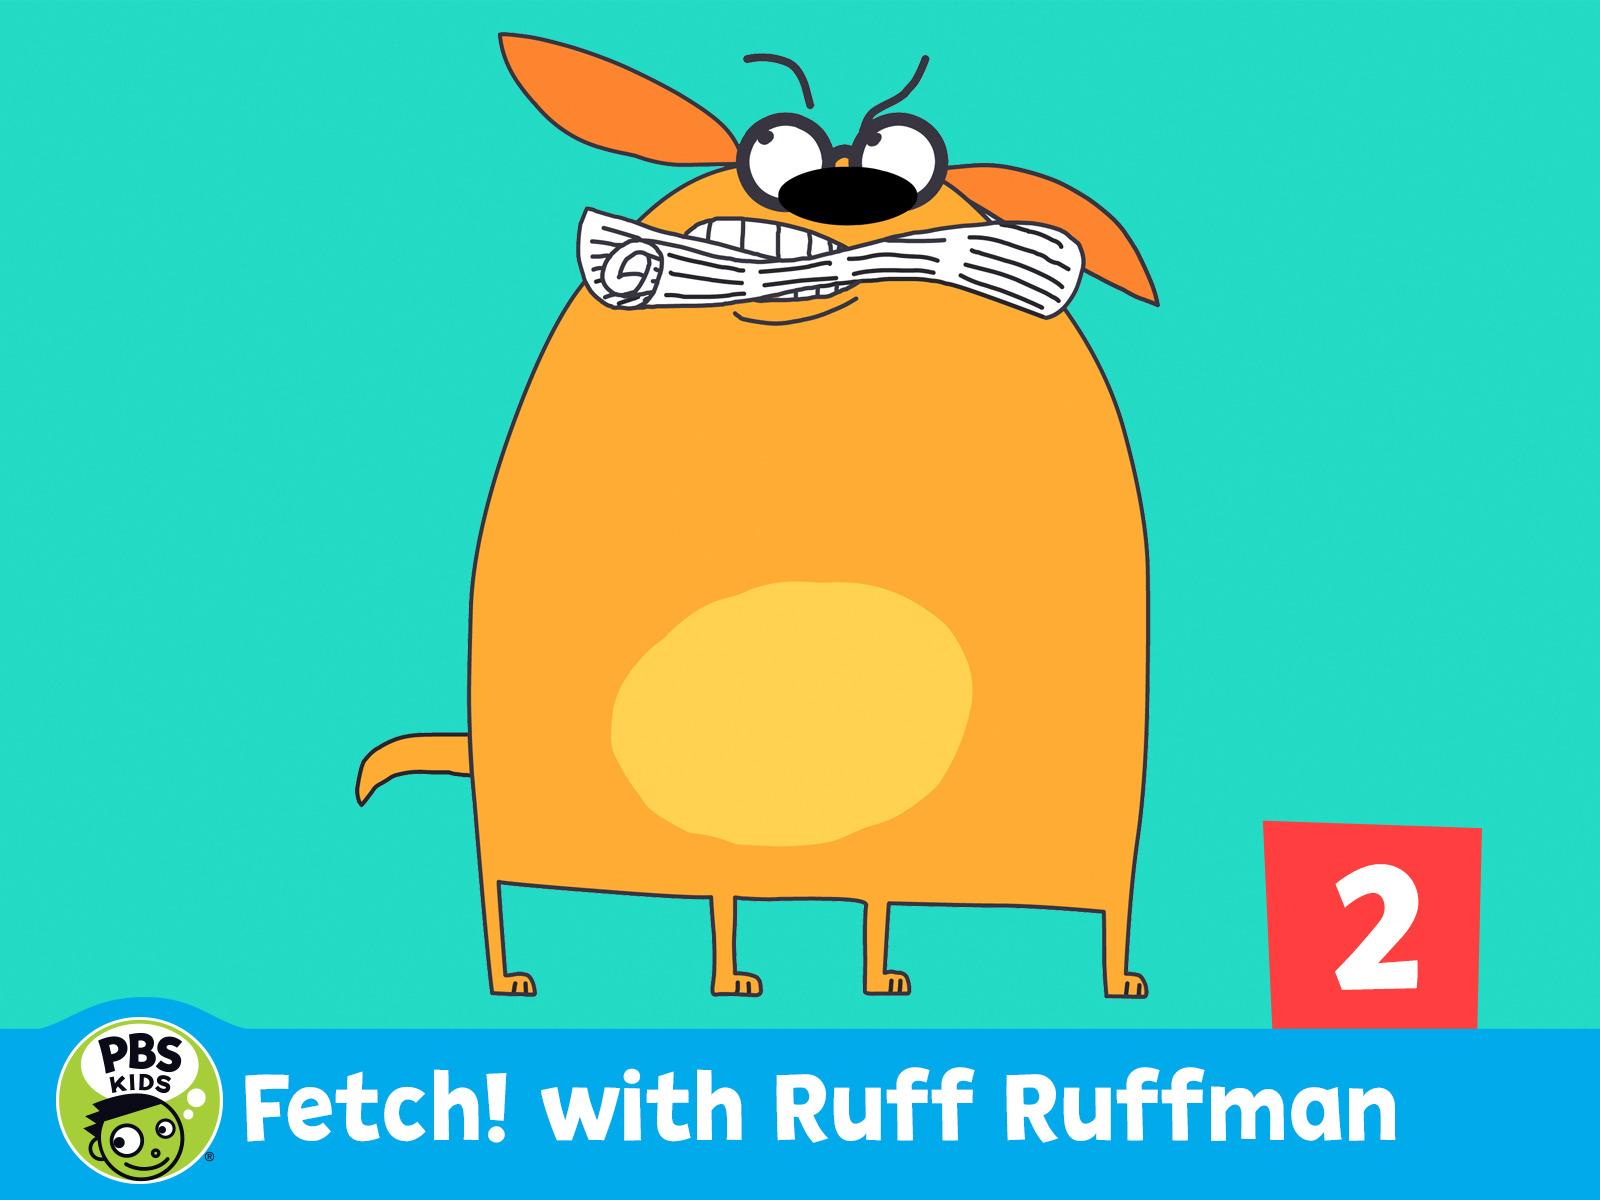 Prime Video: Fetch! With Ruff Ruffman Season 2